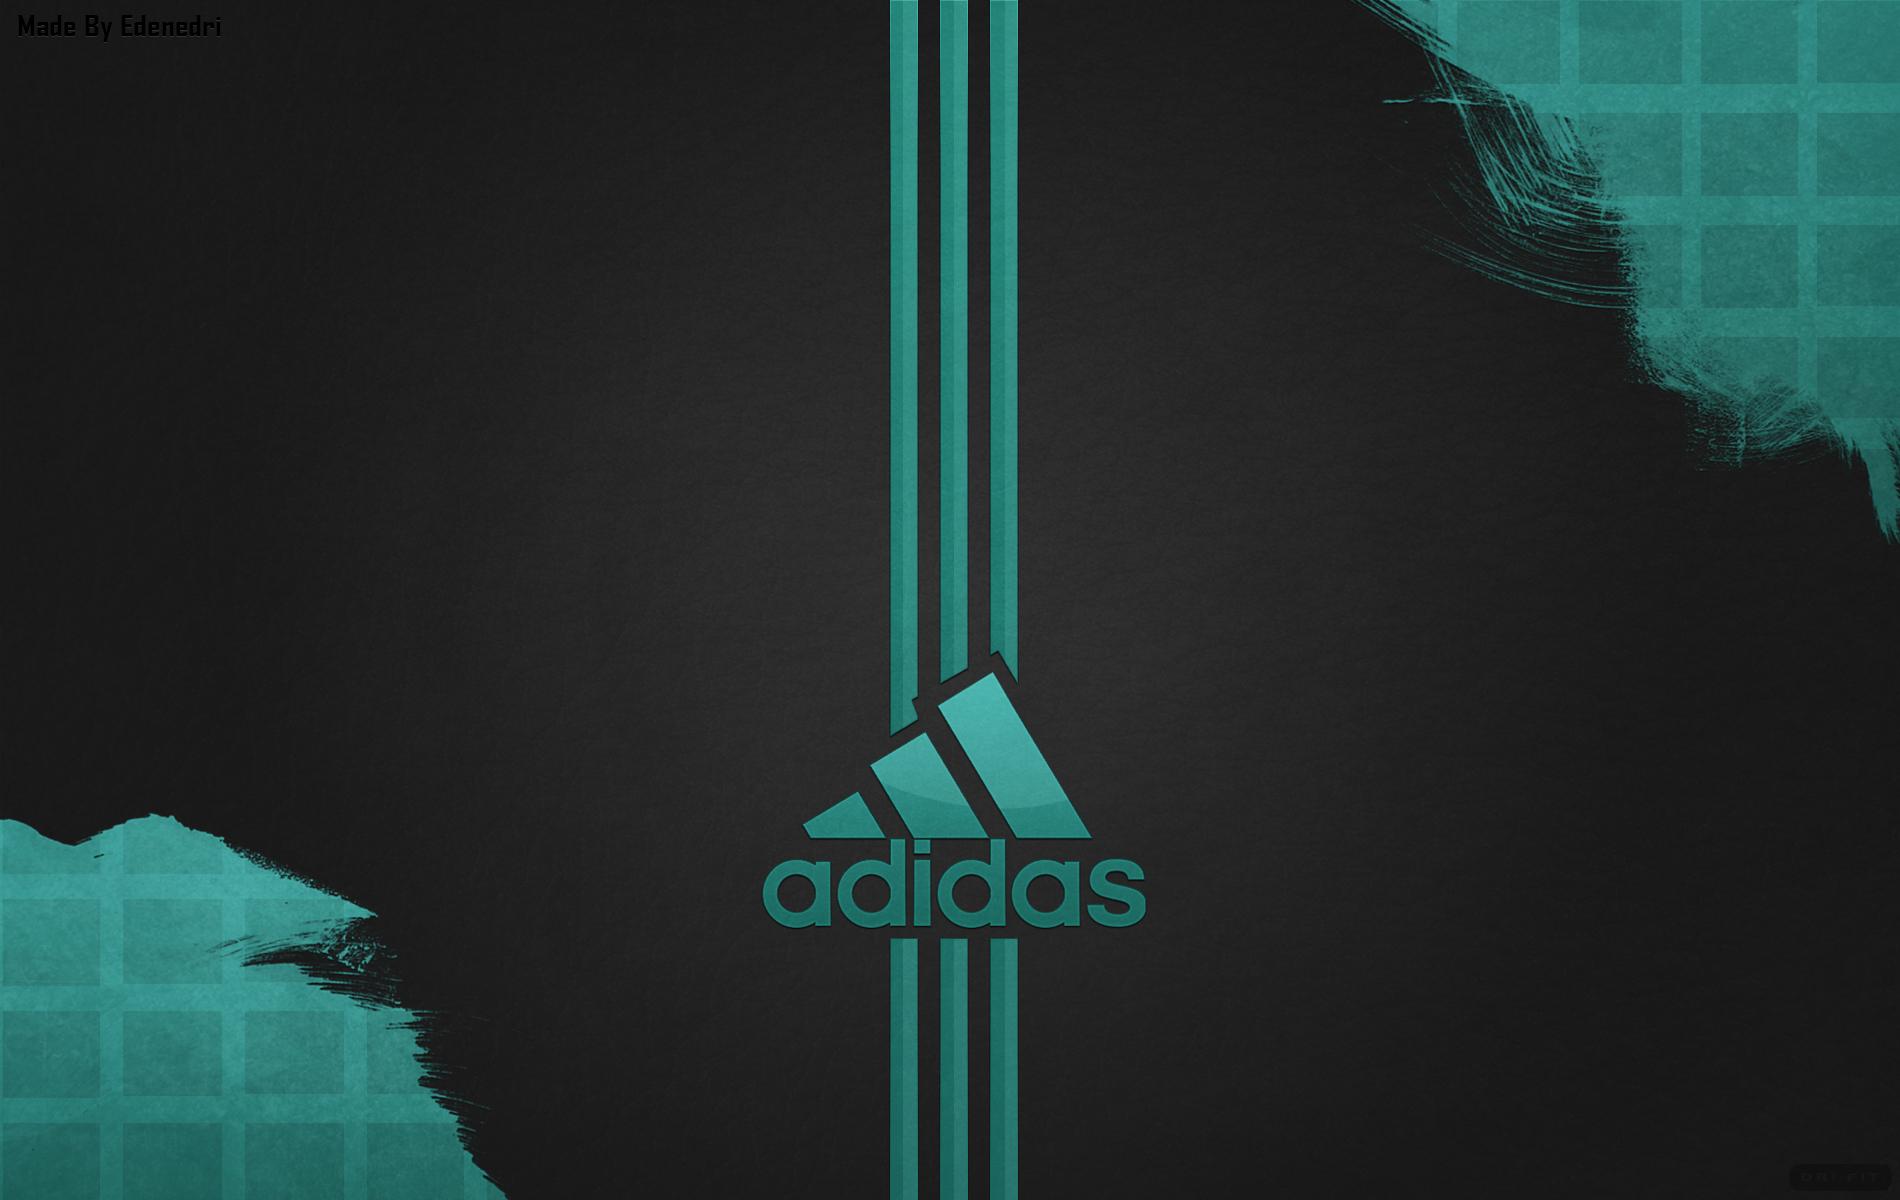 Adidas Backgrounds Wallpapers   ImageBank.biz